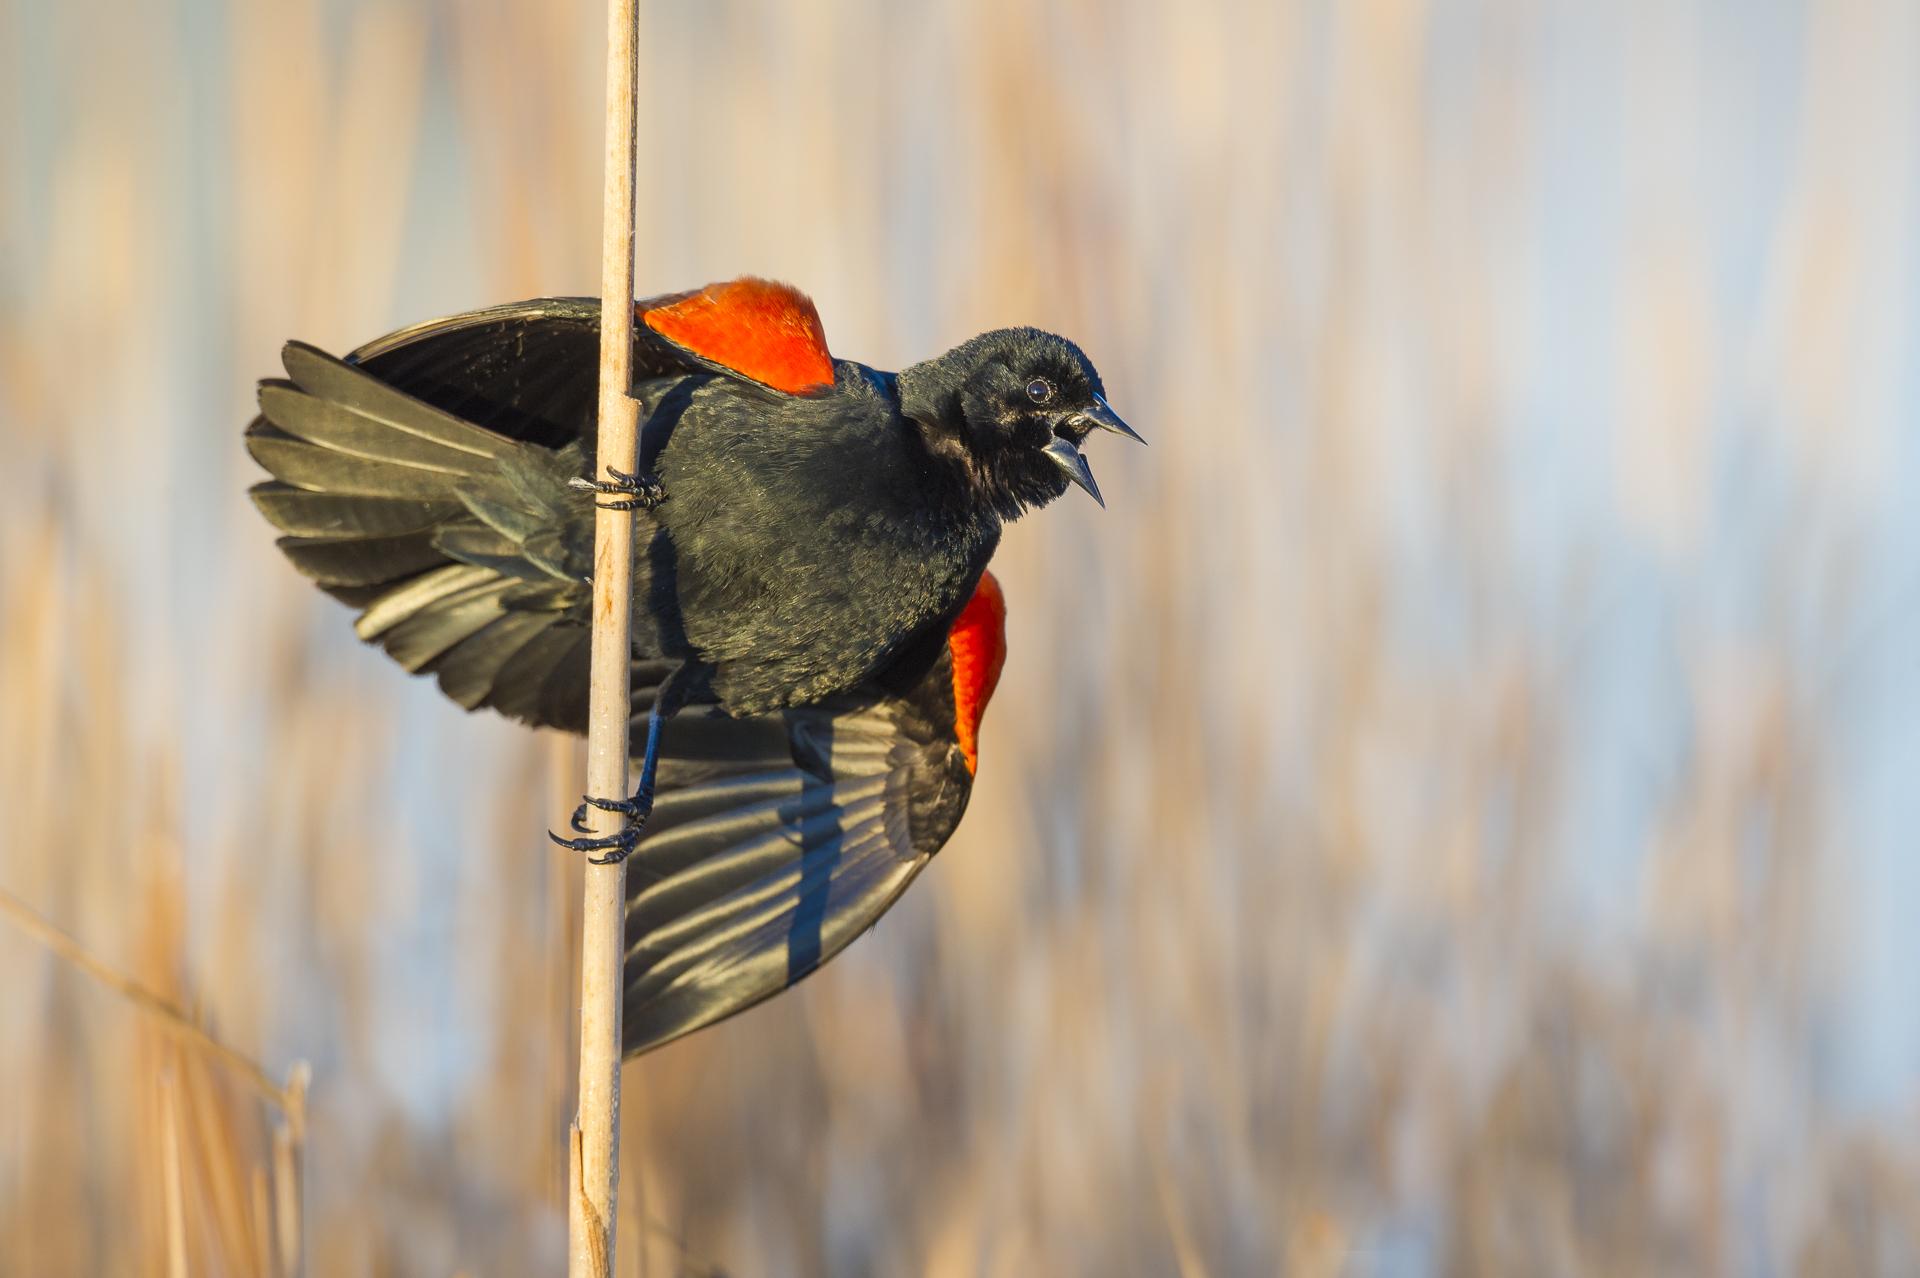 Male red-winged blackbird in full territorial display.